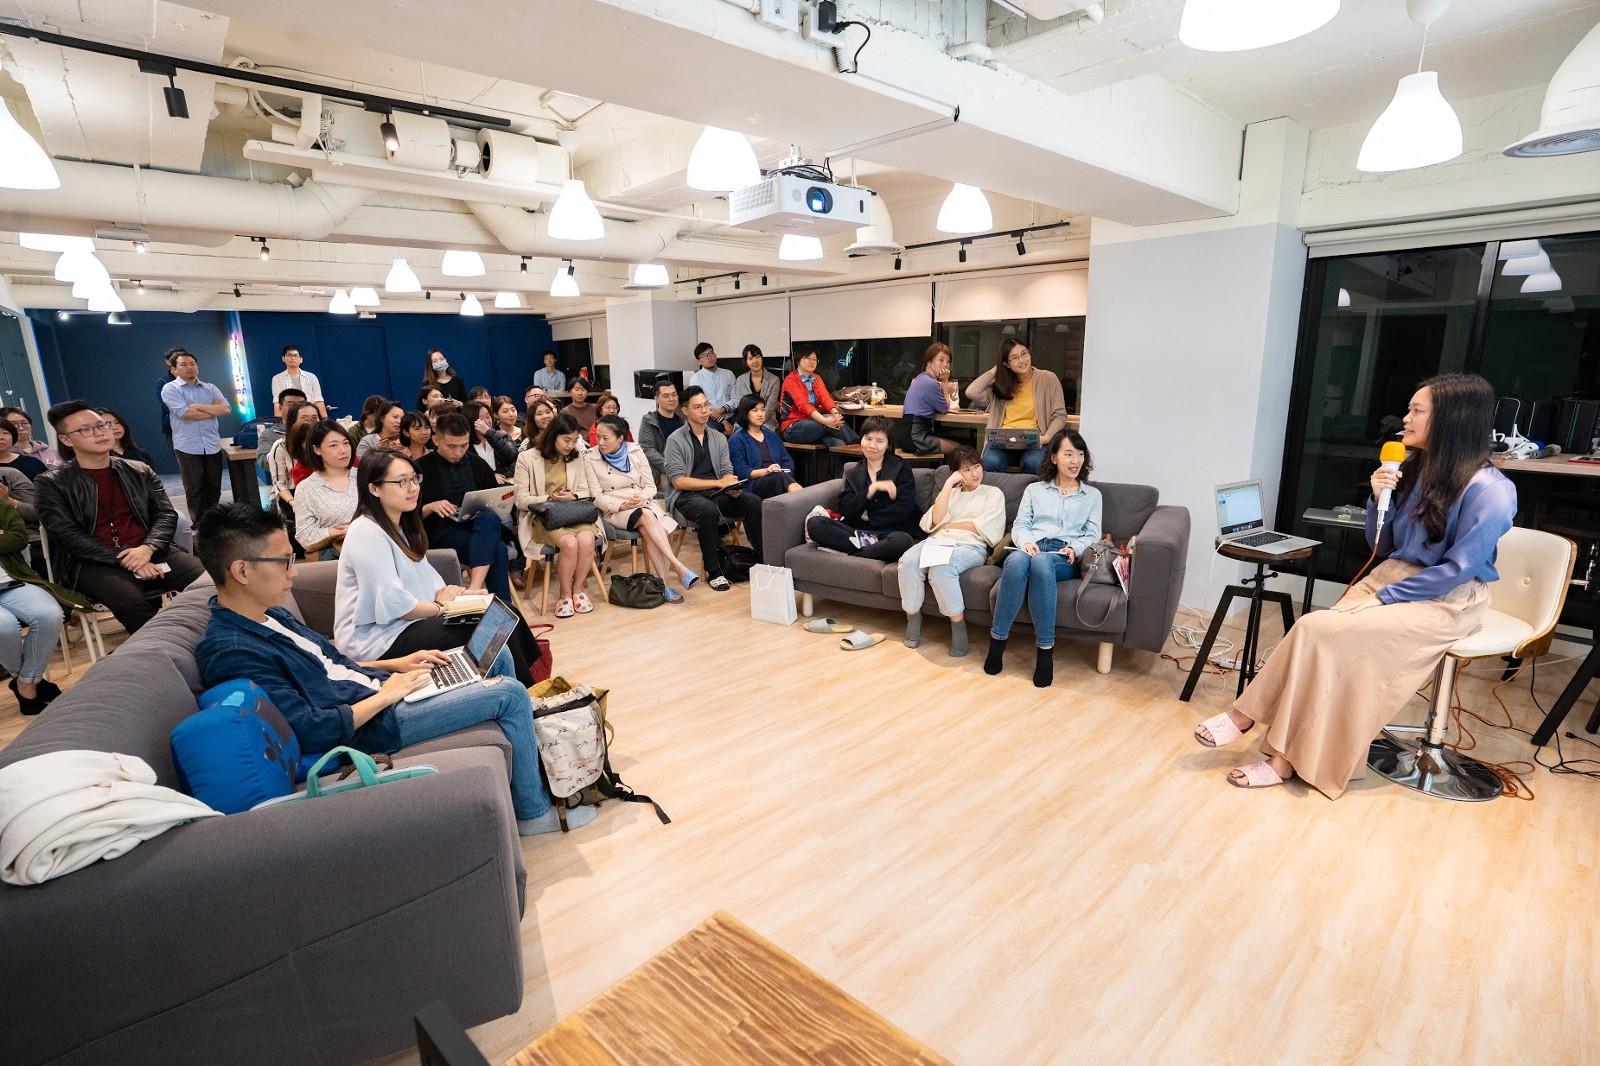 Co-founder, CFO, CHRO of iKala talk to everyone.